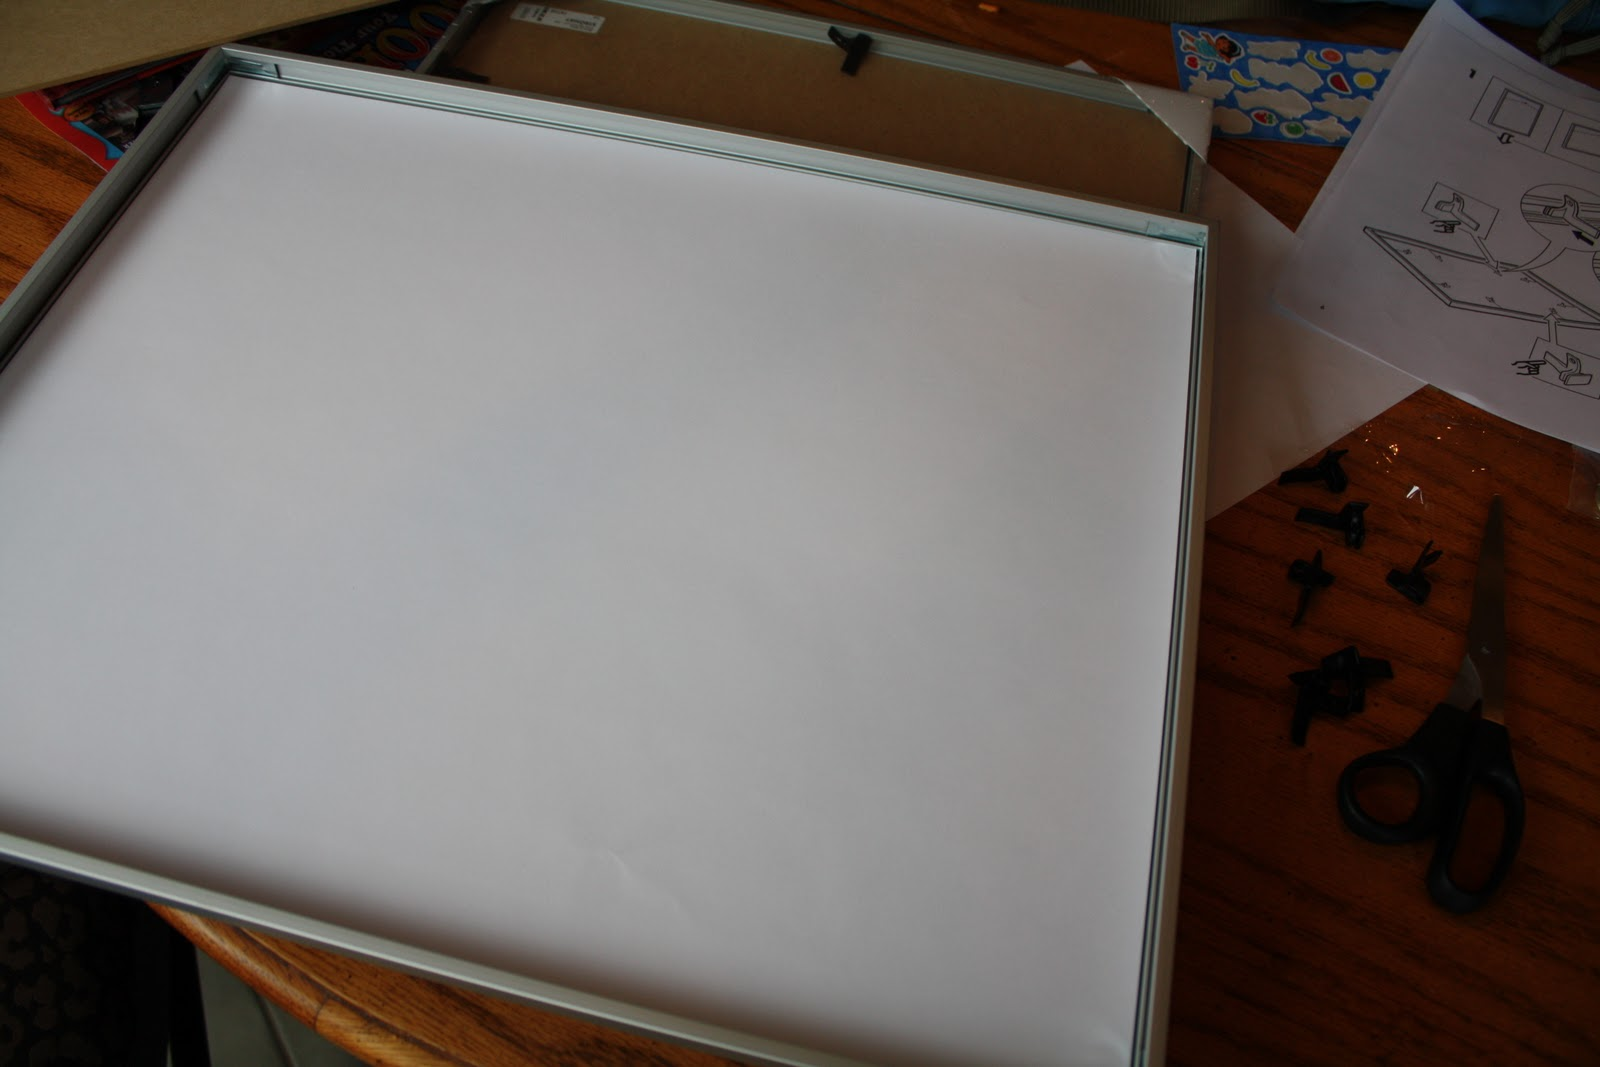 ikea stromby frame instructions